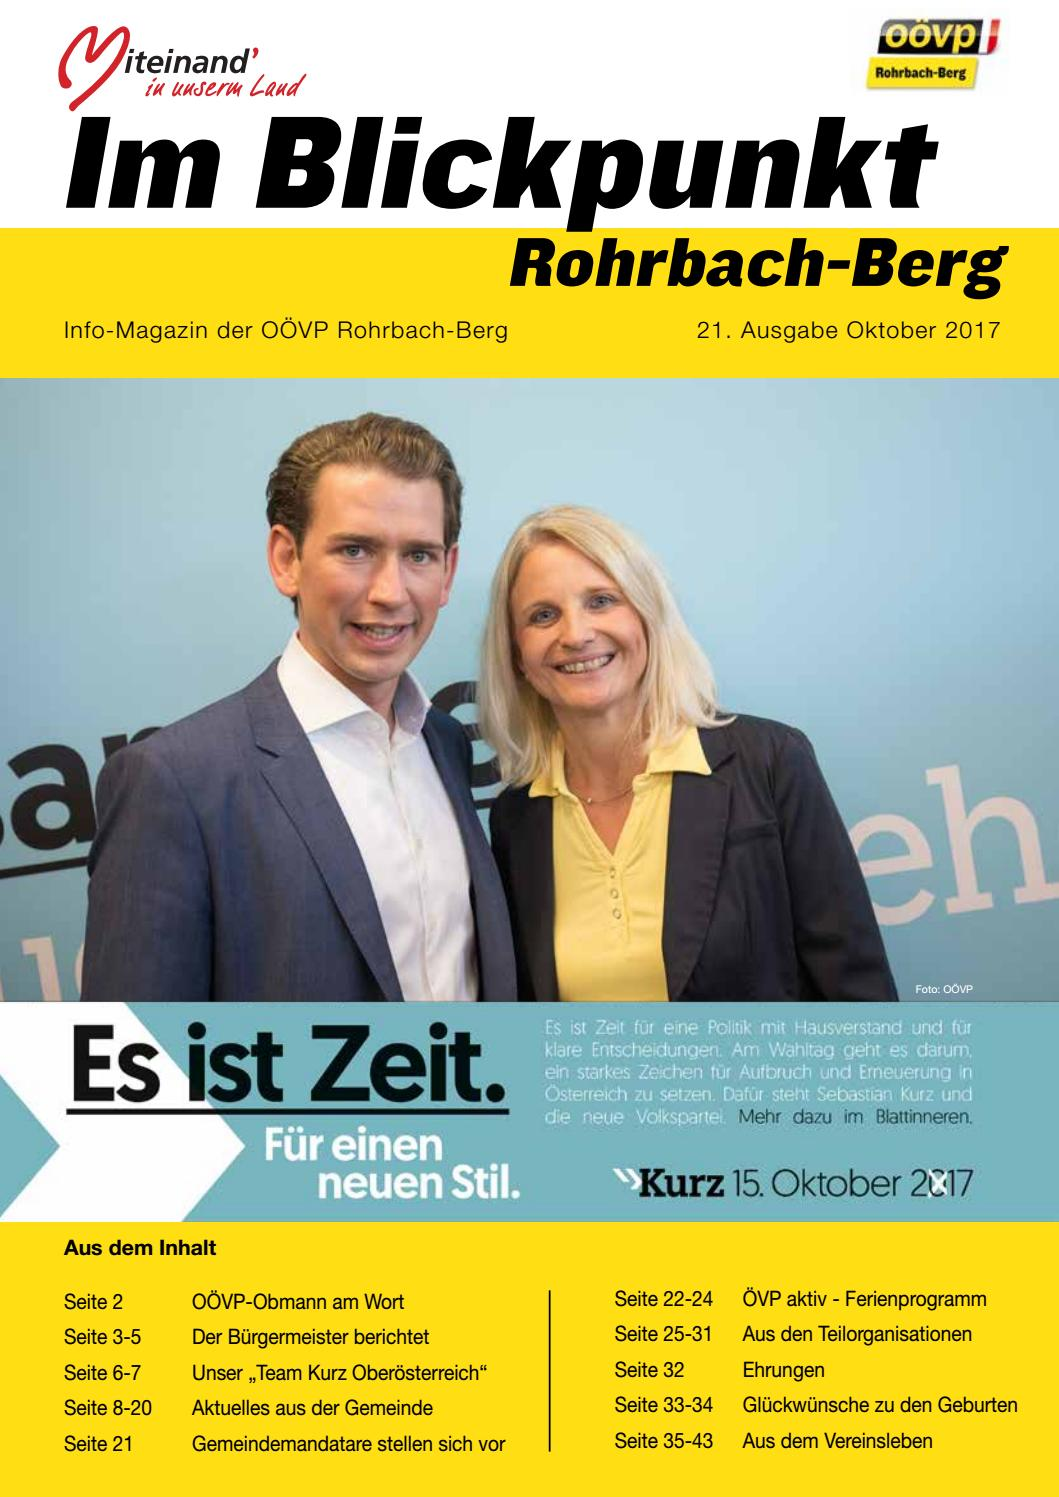 Faustball - Neuigkeiten - Seite 23 - Sportunion Rohrbach-Berg